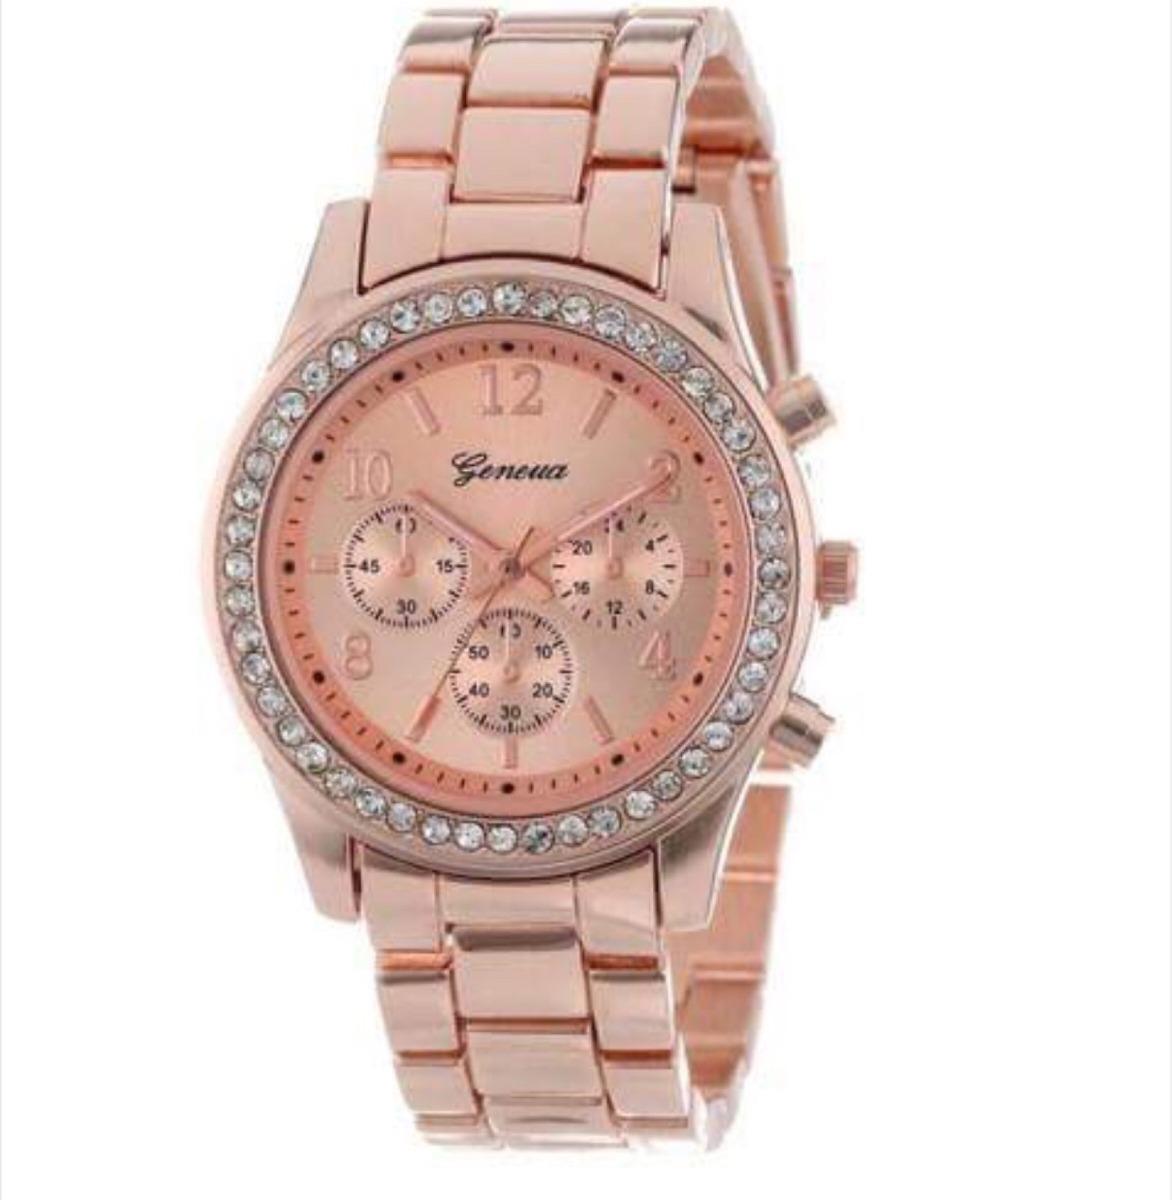 f0ff39dbdc4f reloj mujer esfera con brillantitos color oro rosa nuevo. Cargando zoom.